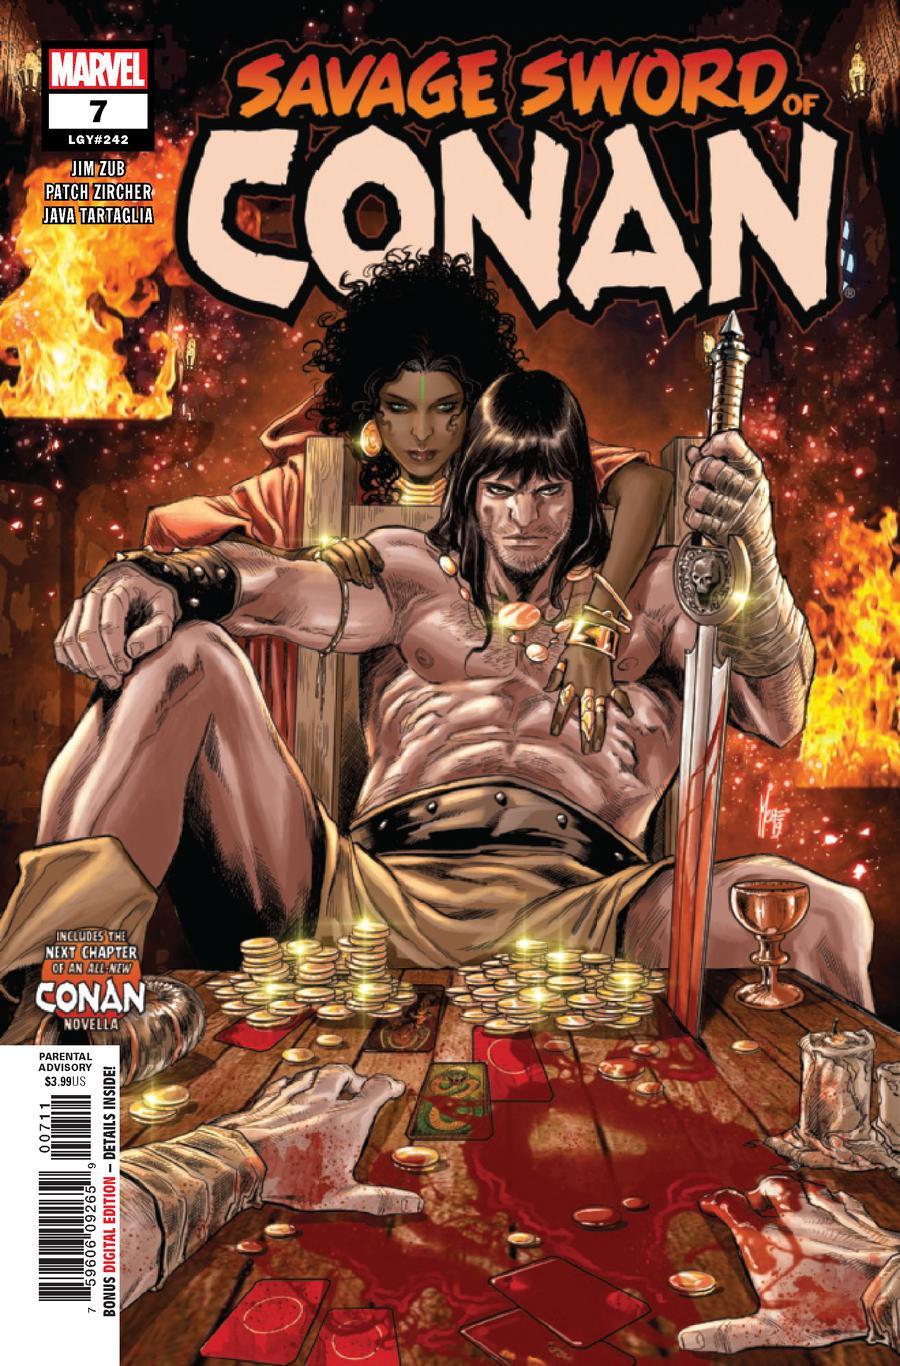 Savage Sword Of Conan #7 Cover A Regular Marco Checchetto Cover